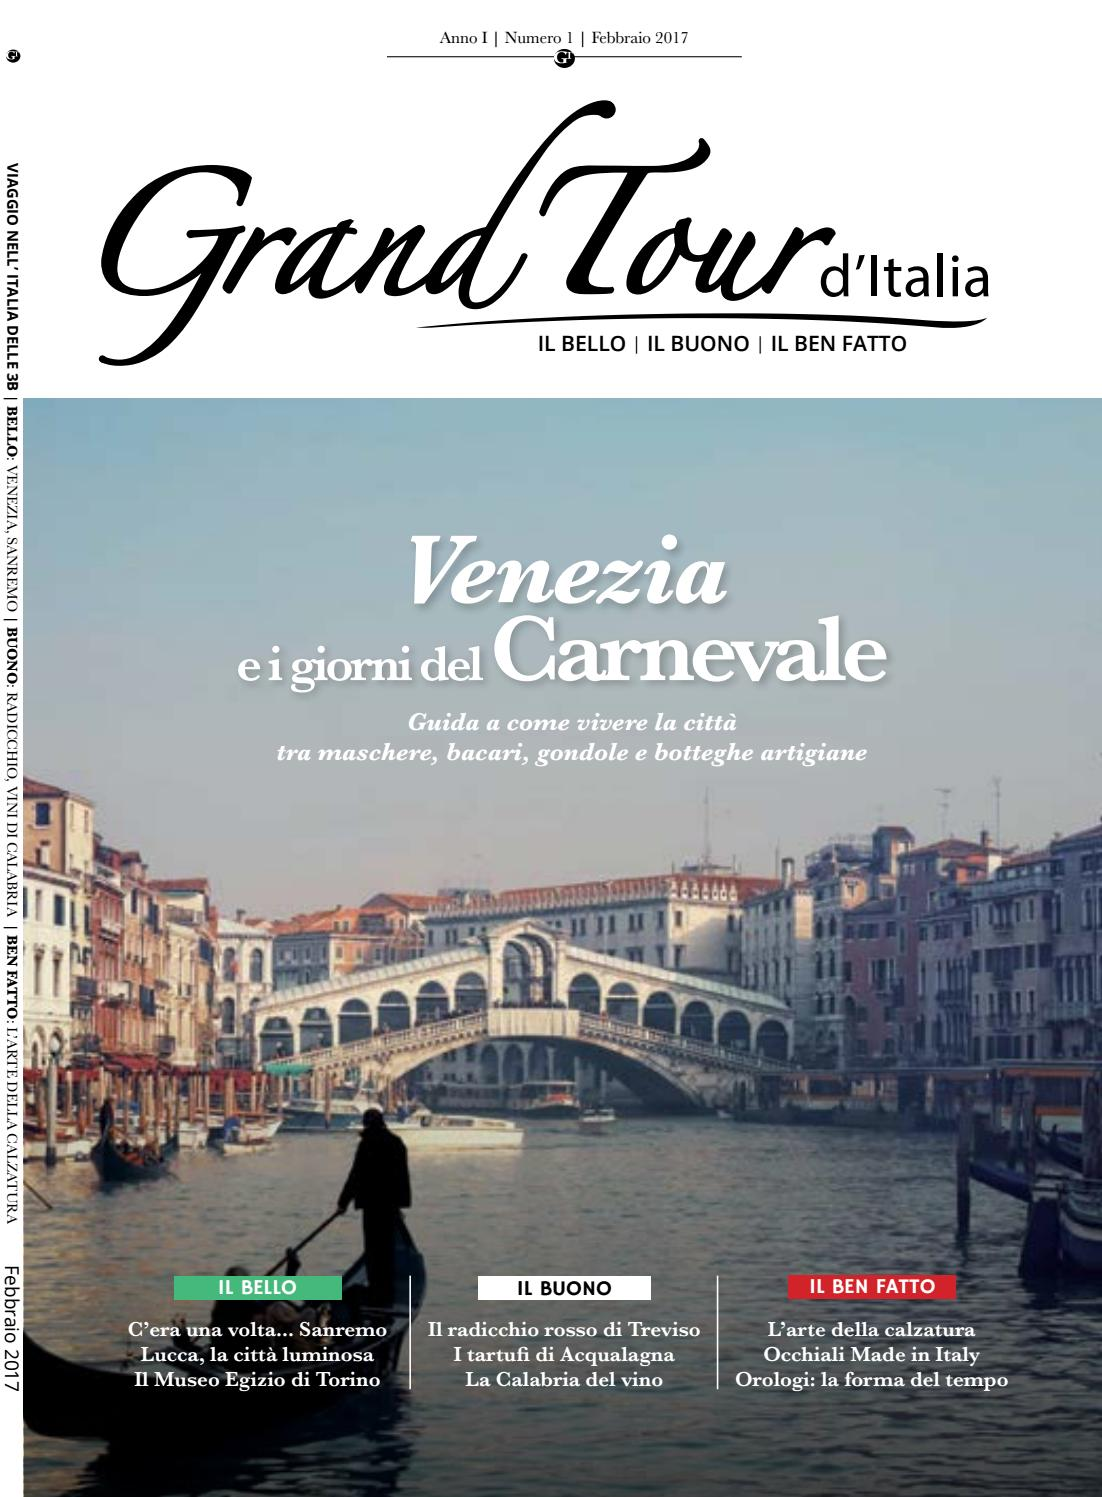 Grandtour febbraio 2017 by vdgmagazine - issuu dc2cdcf65bf